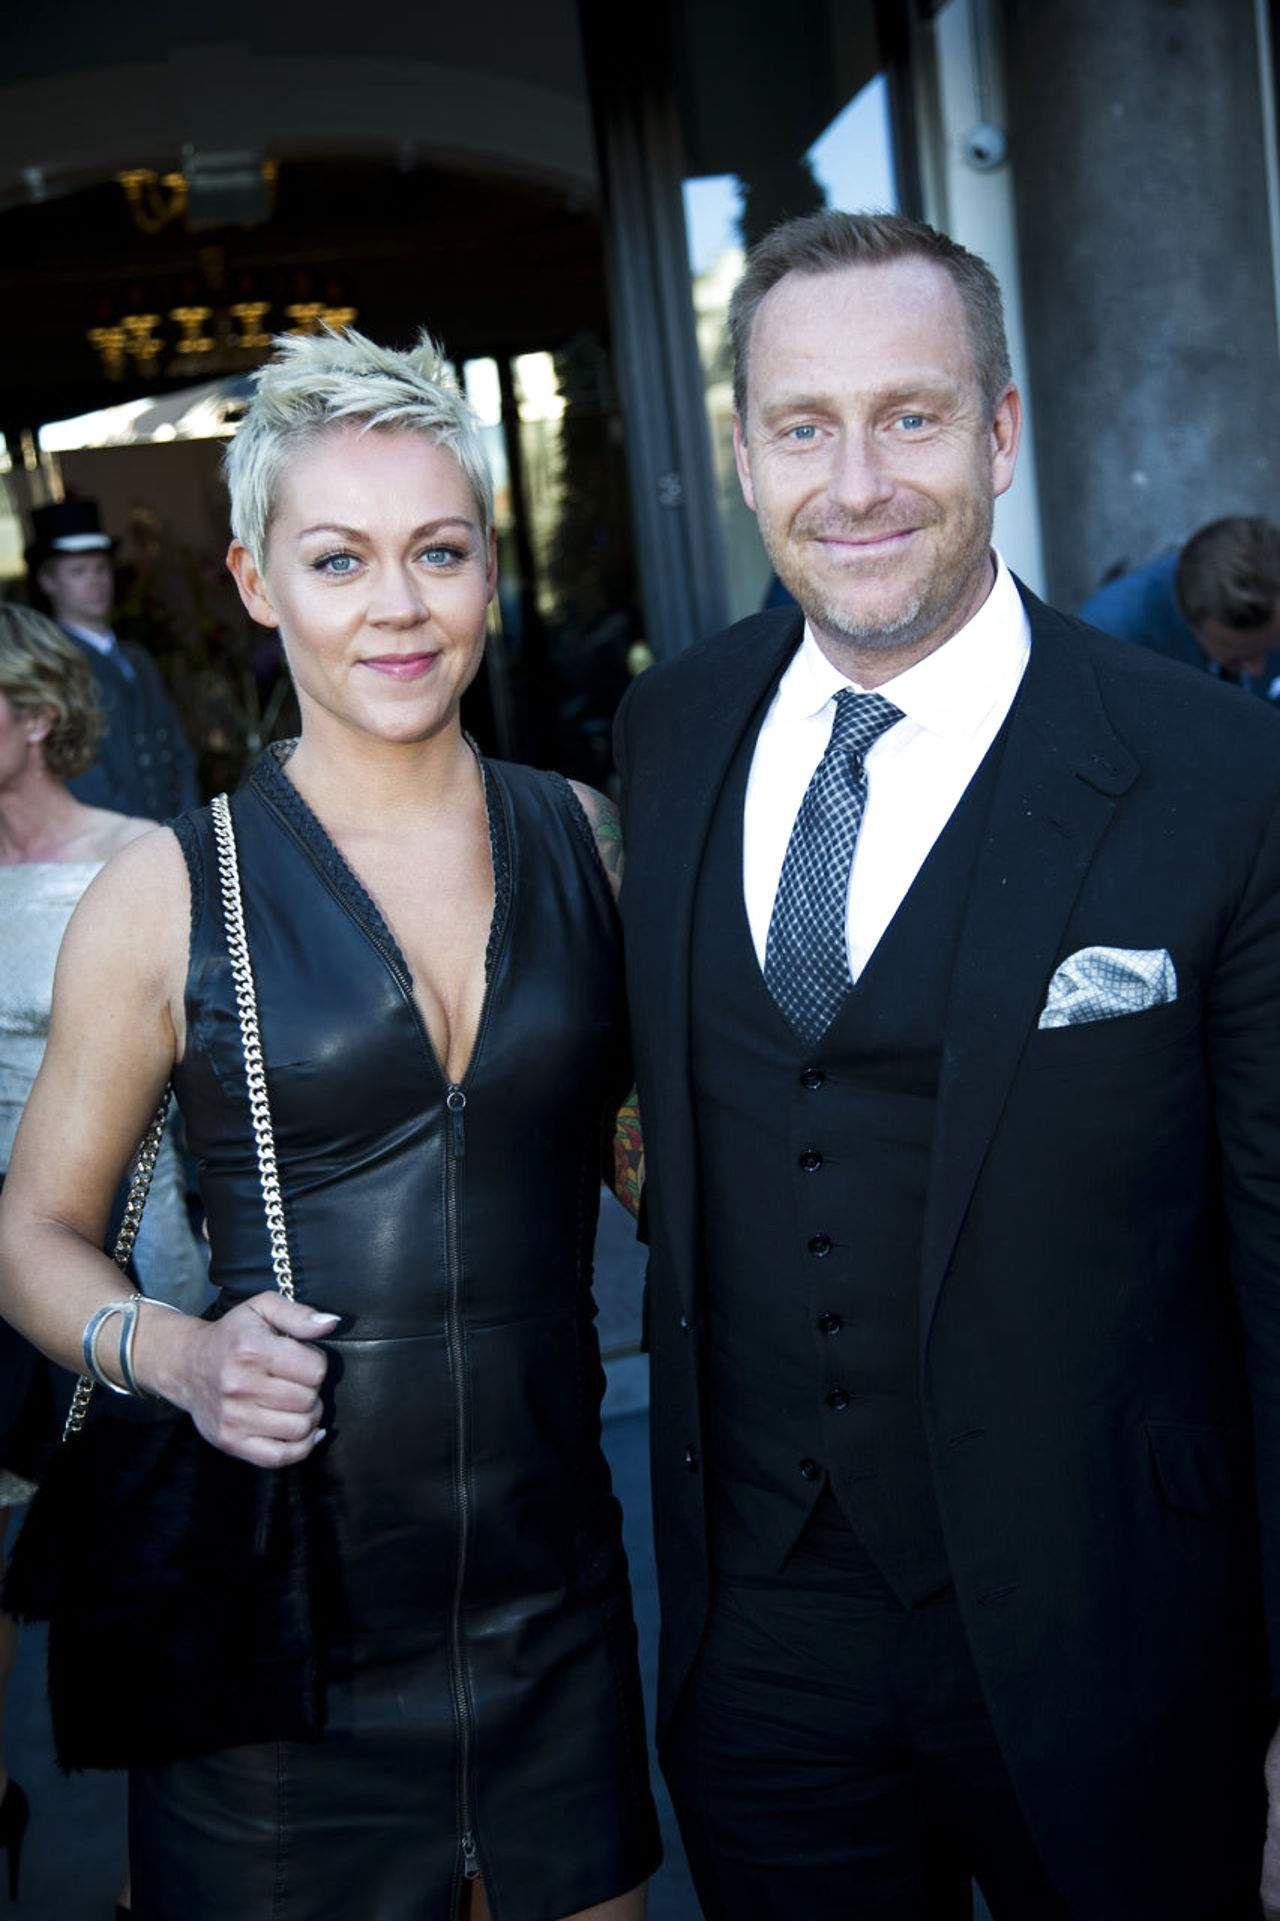 Adam Price med sin kone Mischa Jemer.